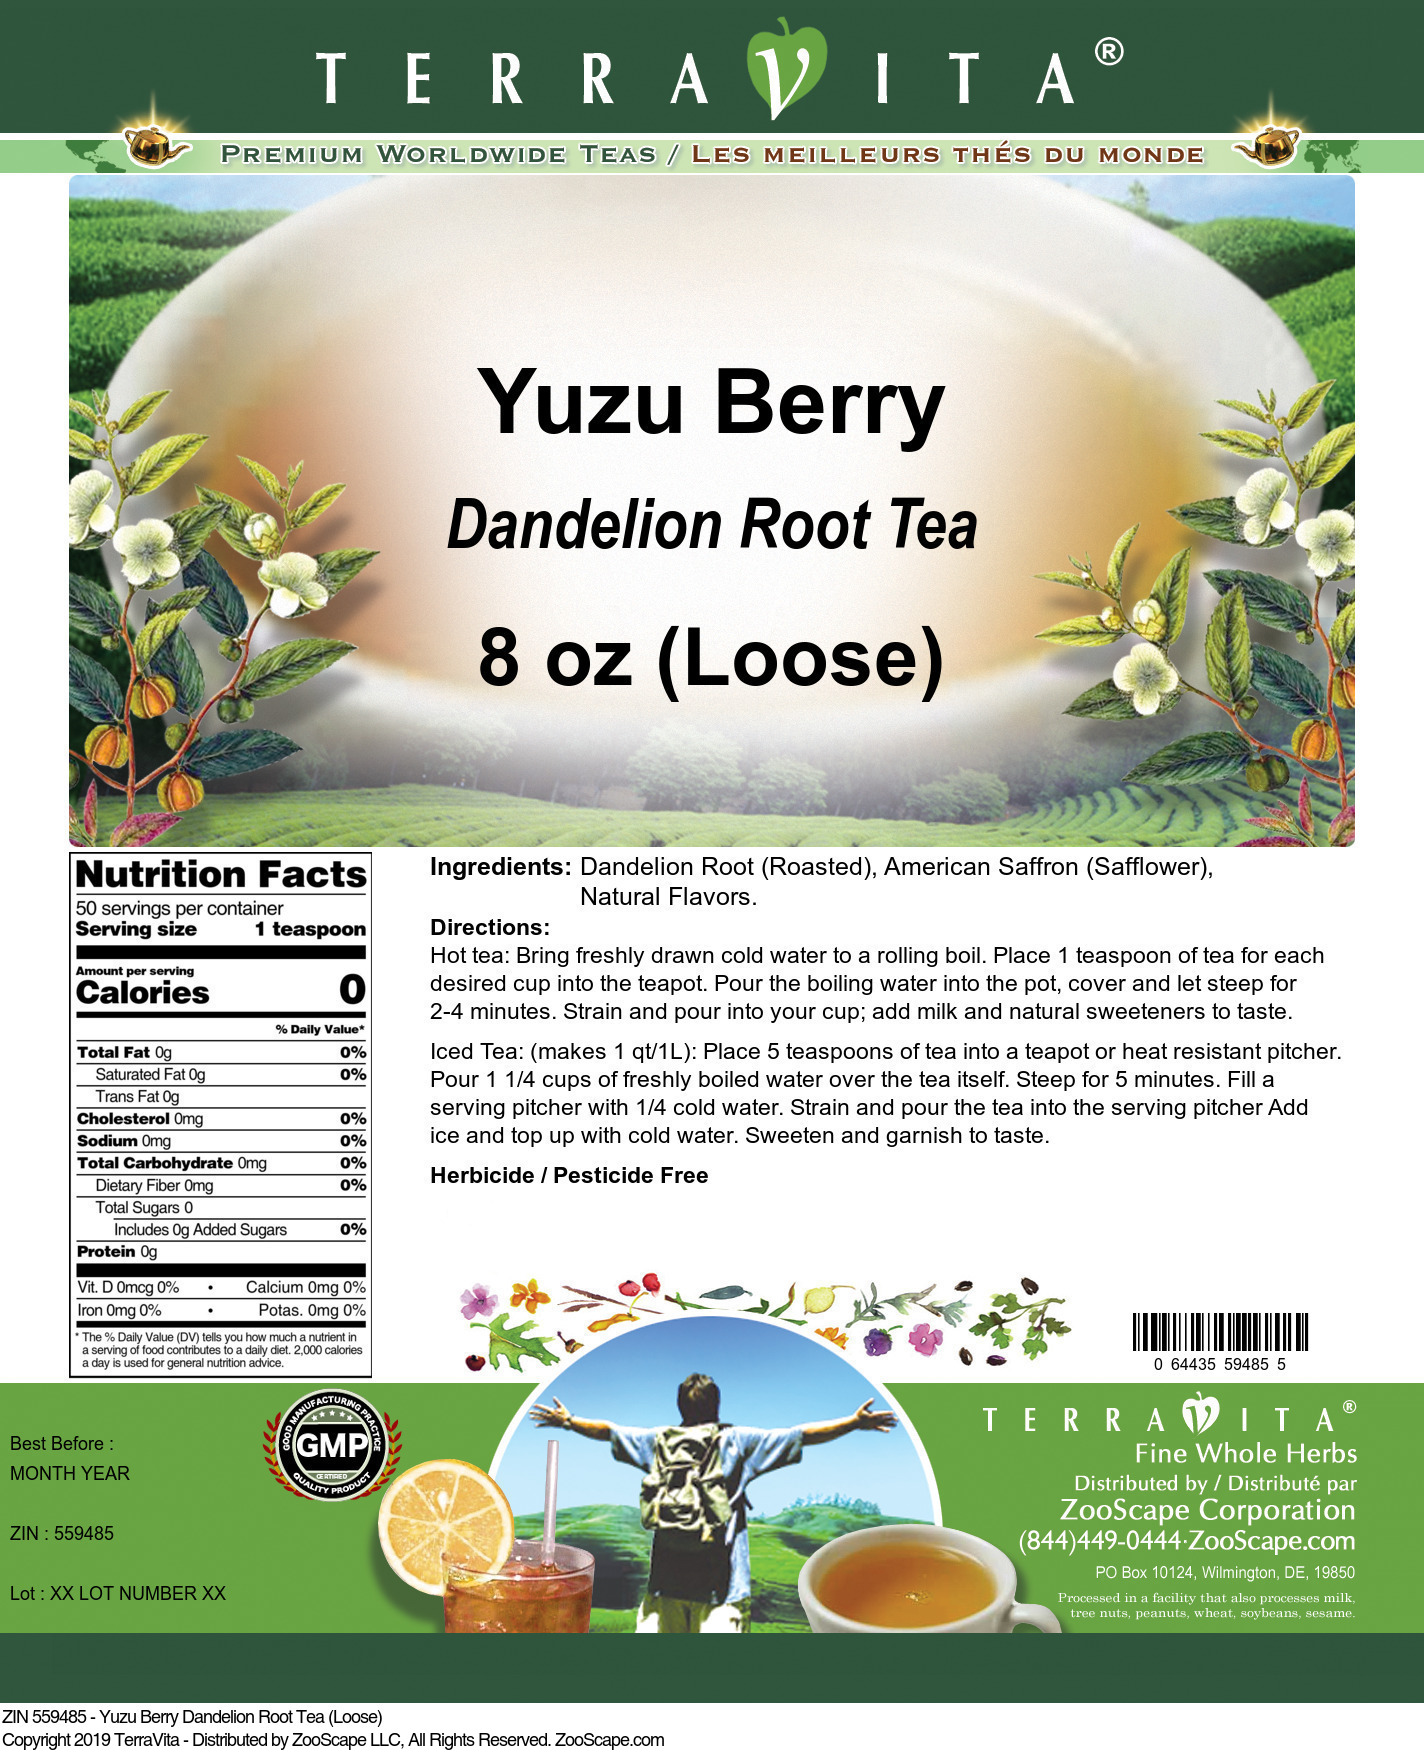 Yuzu Berry Dandelion Root Tea (Loose)